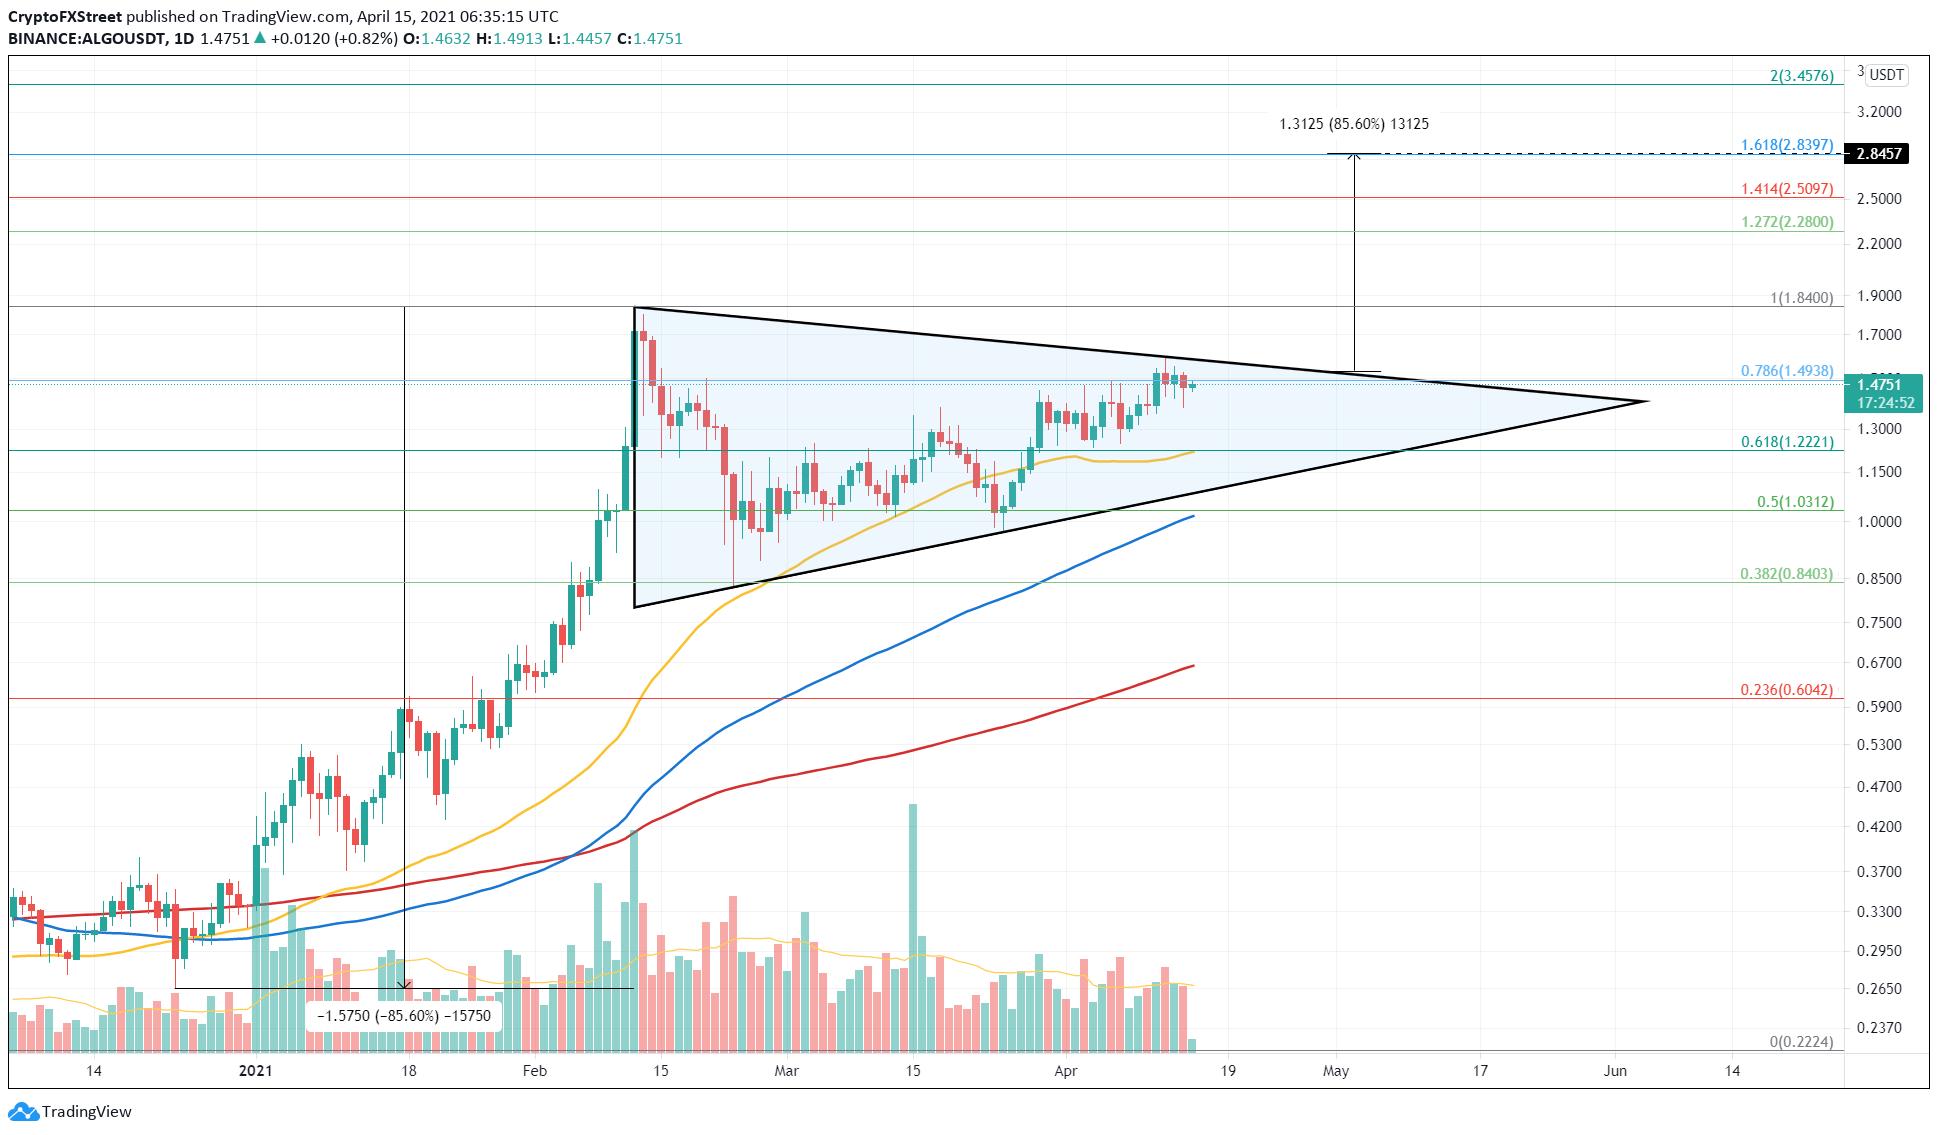 ALGO/USDT 1-day chart